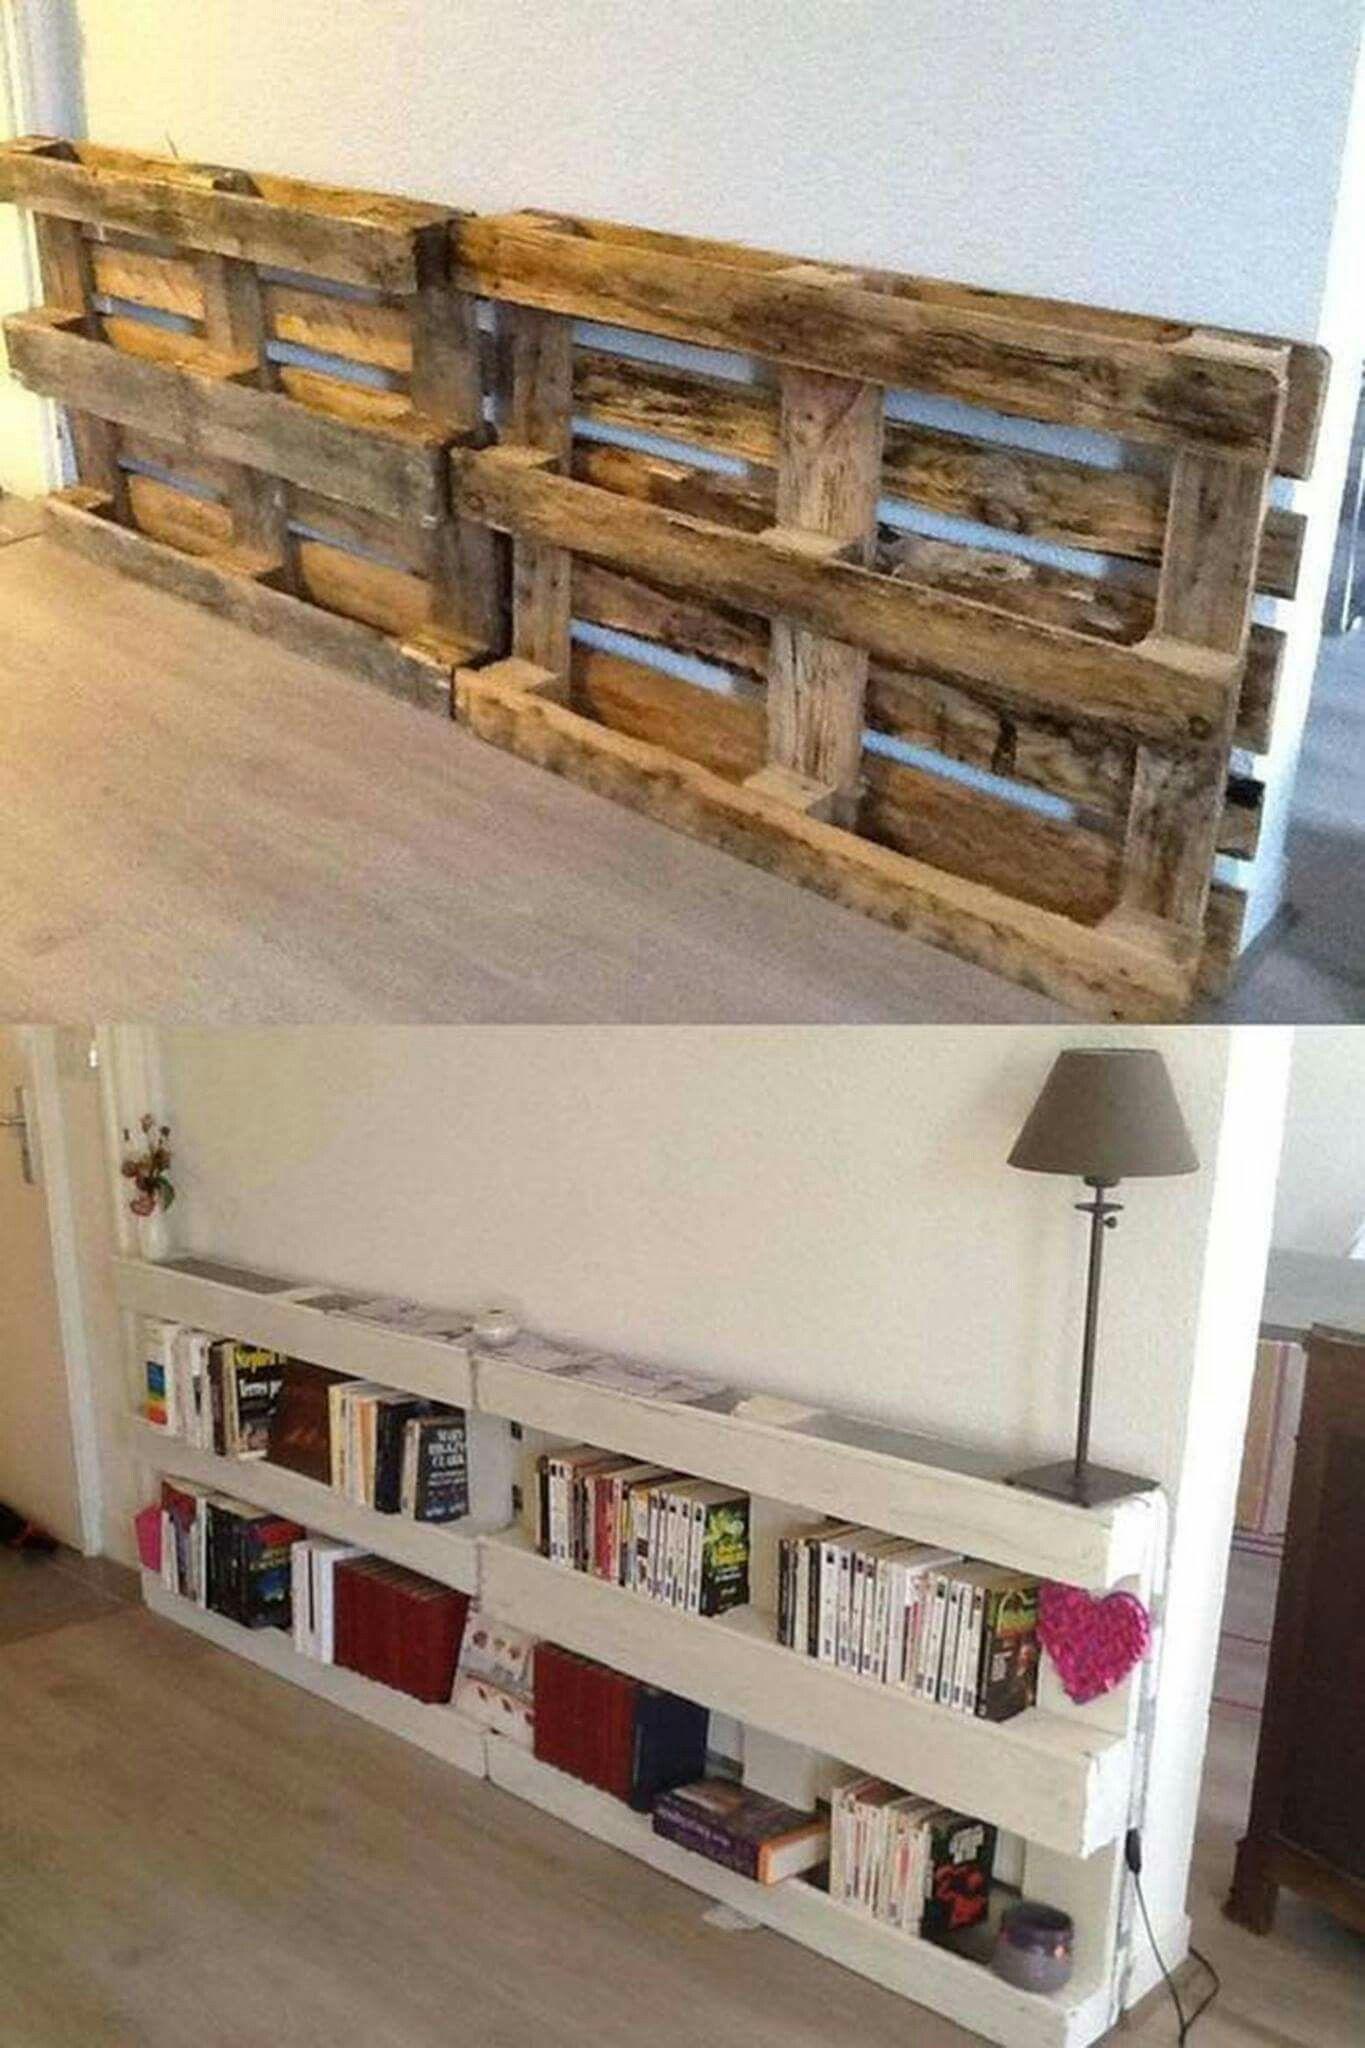 Media Shelf Made Out Of Pallets Bookshelves Diy Home Diy